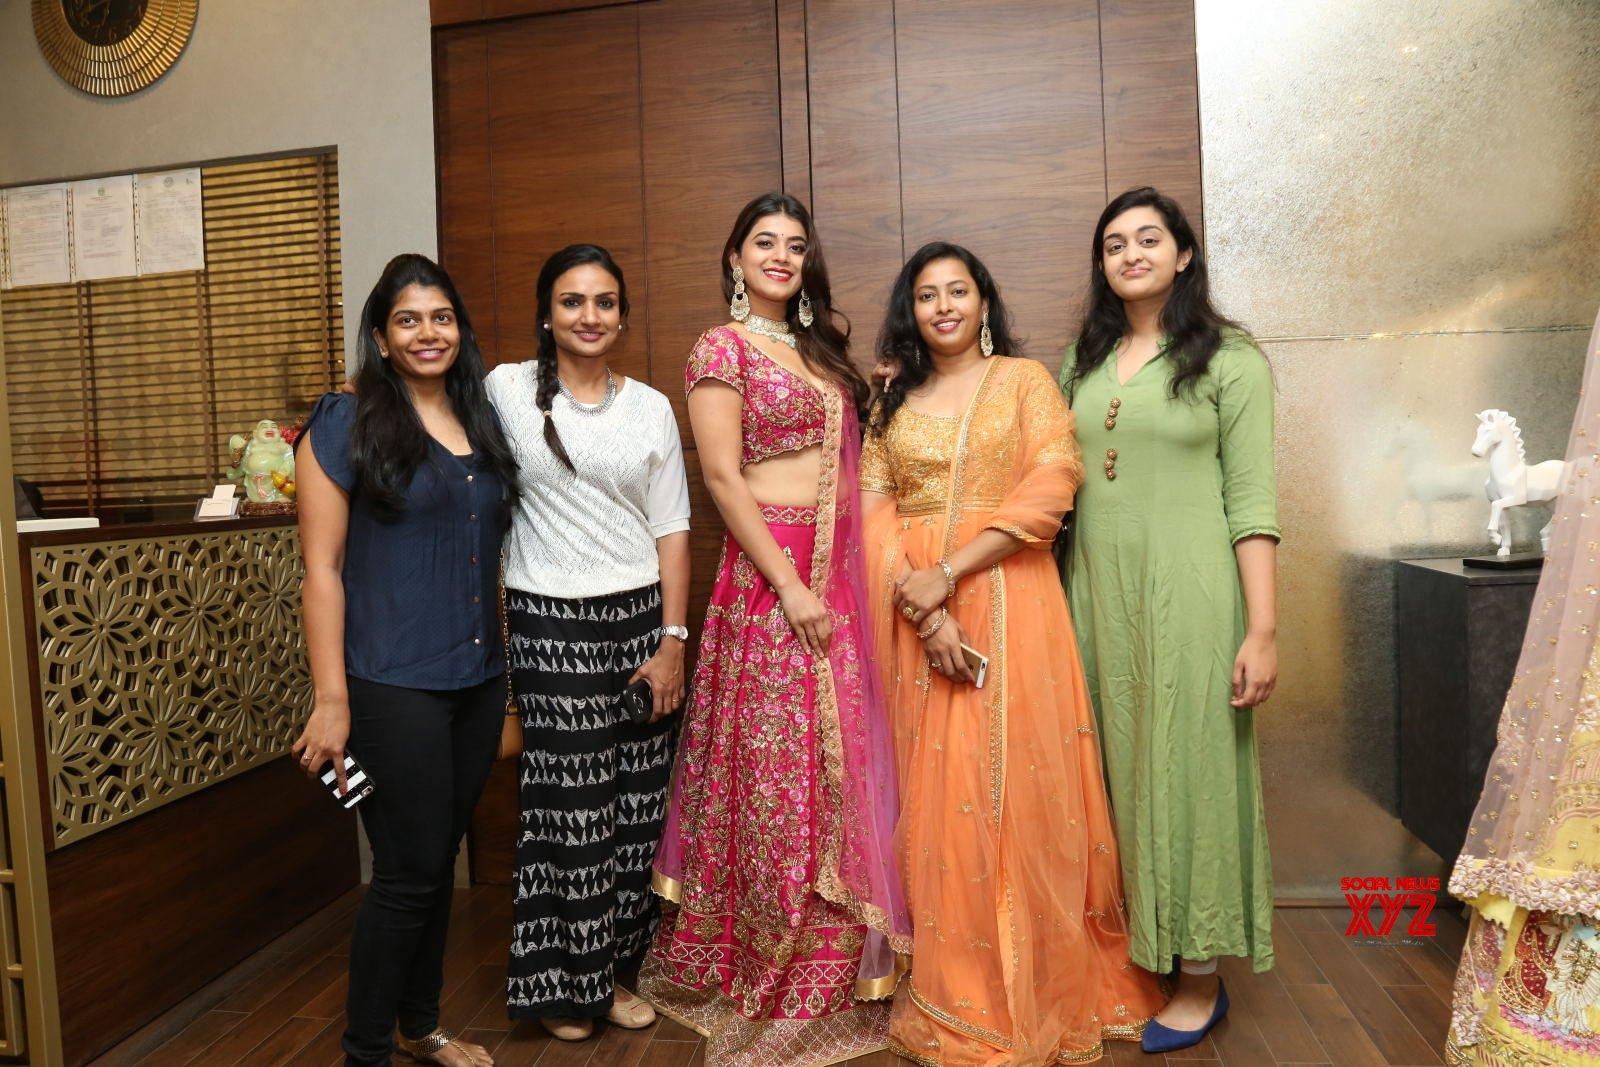 Yamini Bhaskar Launches Priya Design Studio's New Pret And Bridal Collection - Gallery